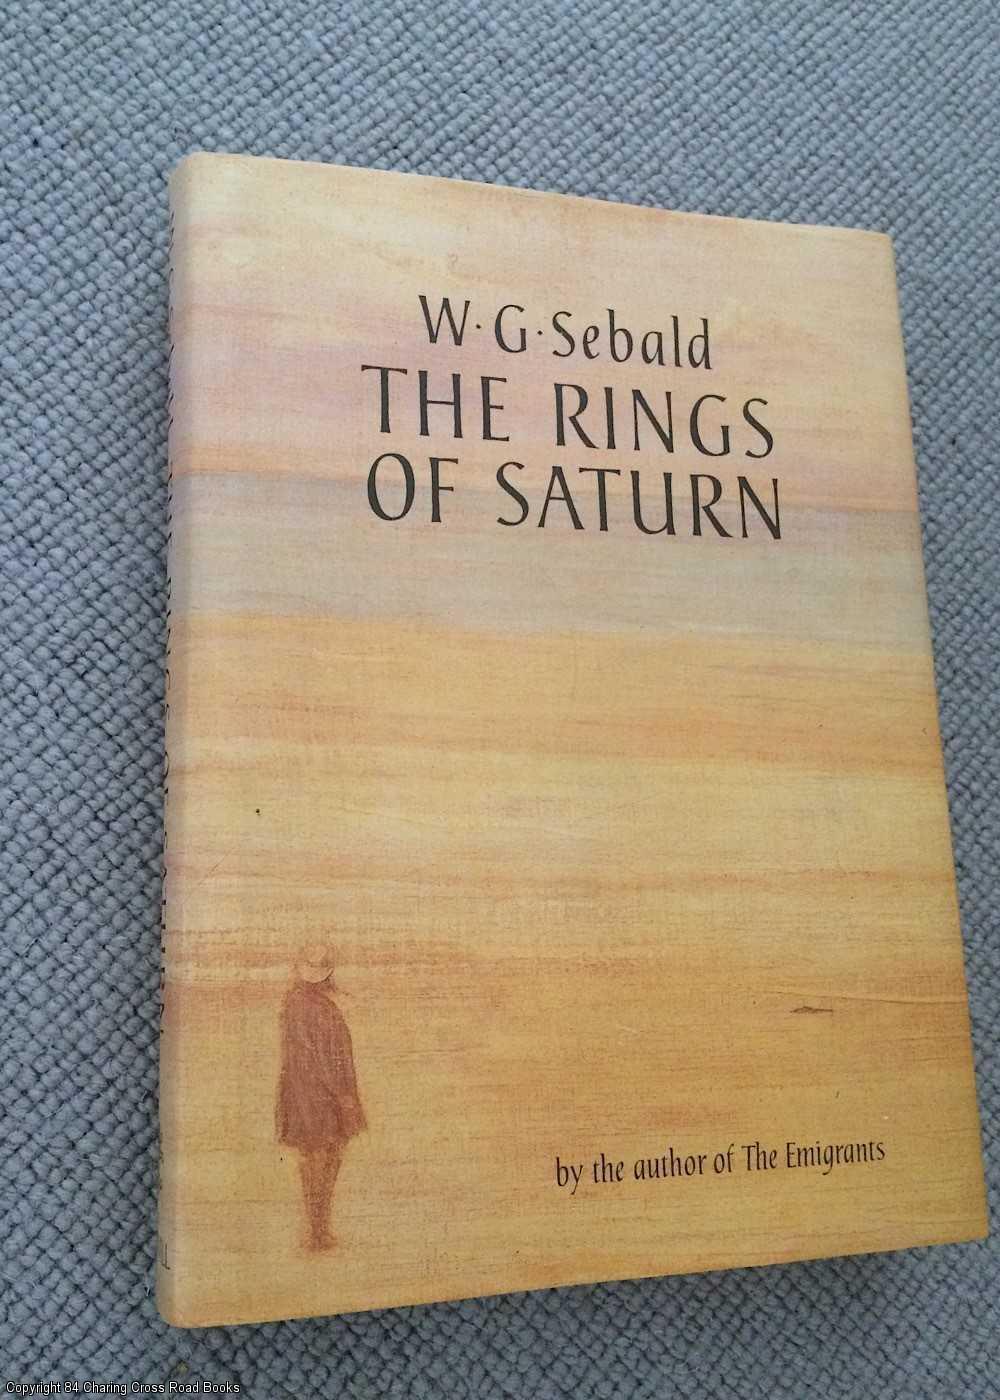 The Rings of Saturn: An English Pilgrimage: Sebald, W. G.